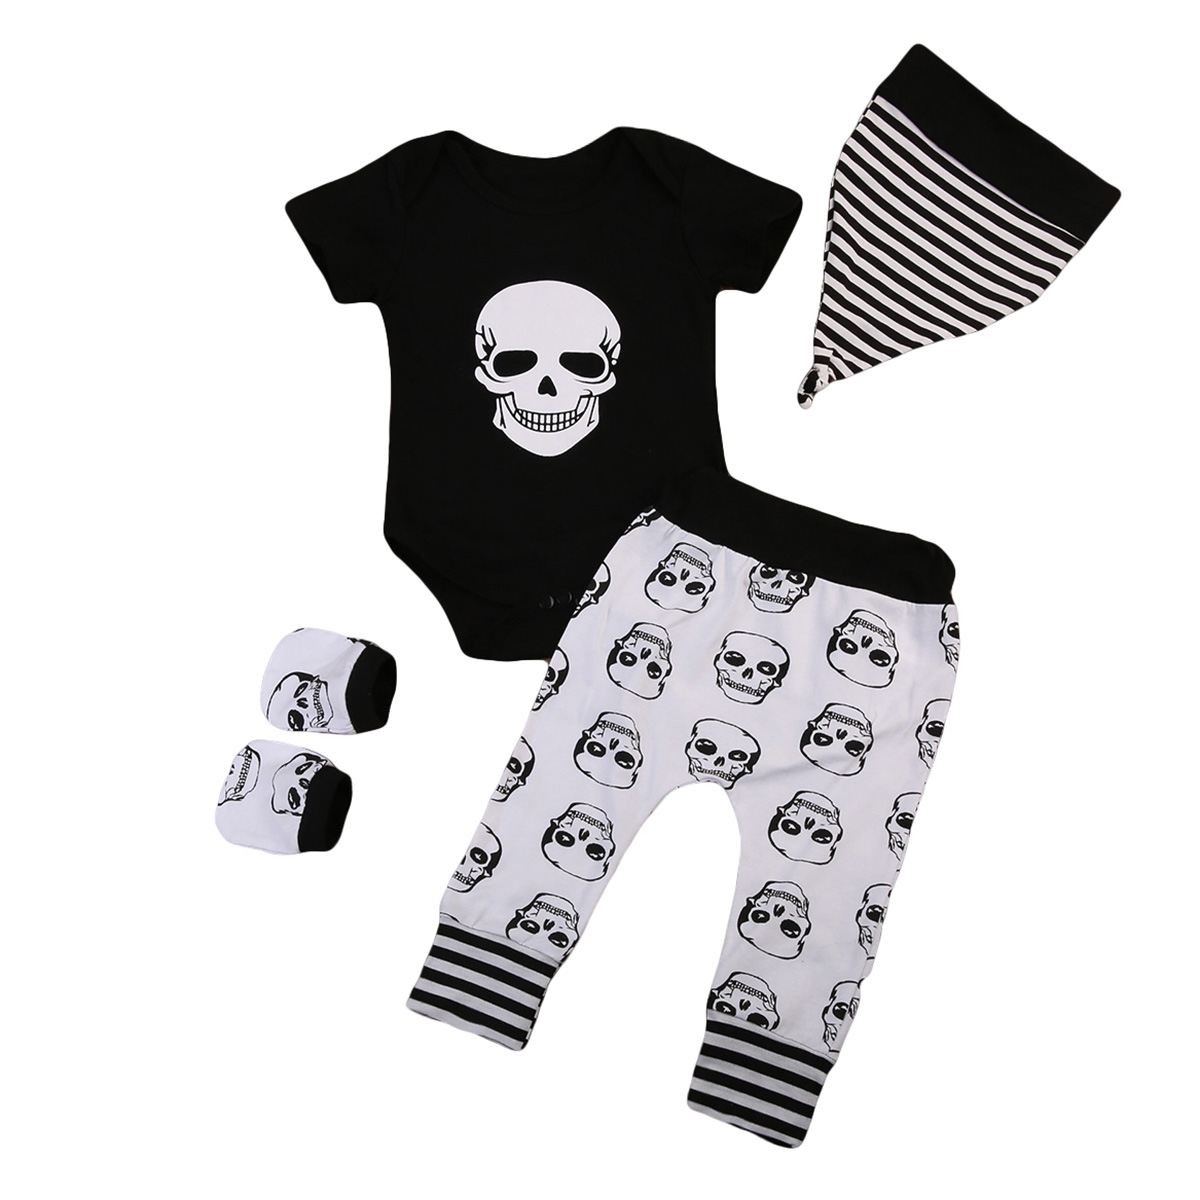 4PCS Set Newborn Toddler Infant Baby Boy Skull Clothes Short Sleeve Romper Bodysuit Tops+Legging Pants Hat Outfits Clothing Set